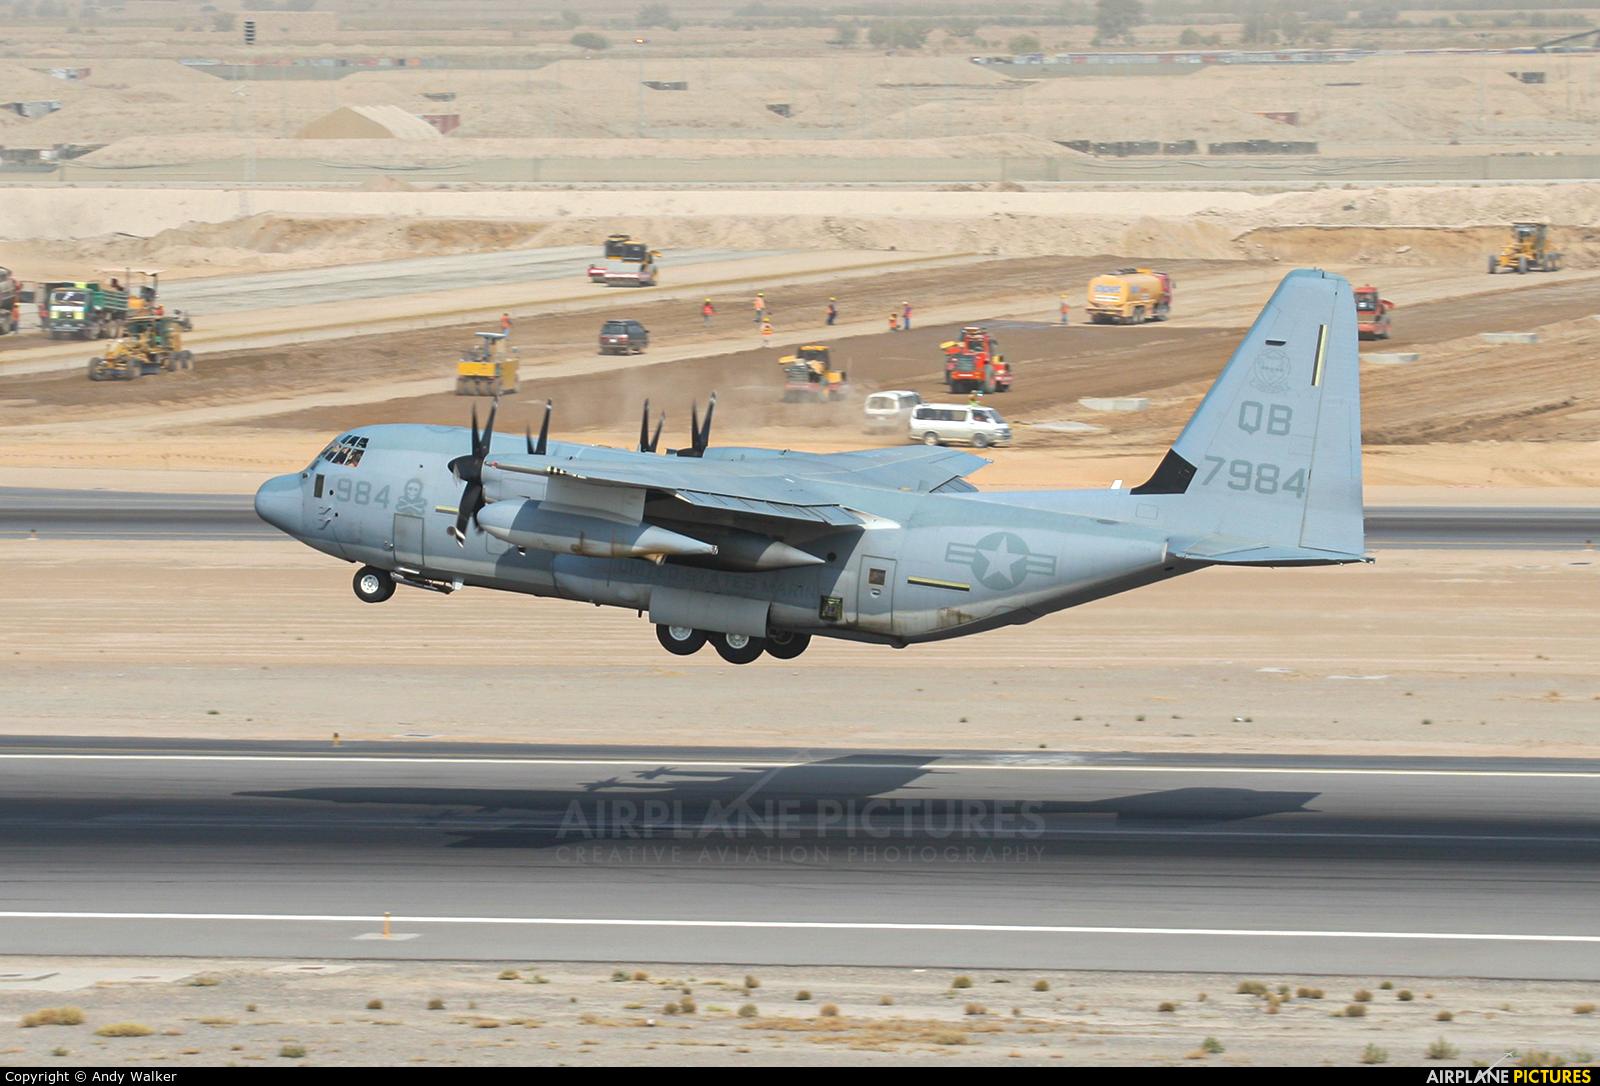 USA - Marine Corps 167984 aircraft at Kandahar